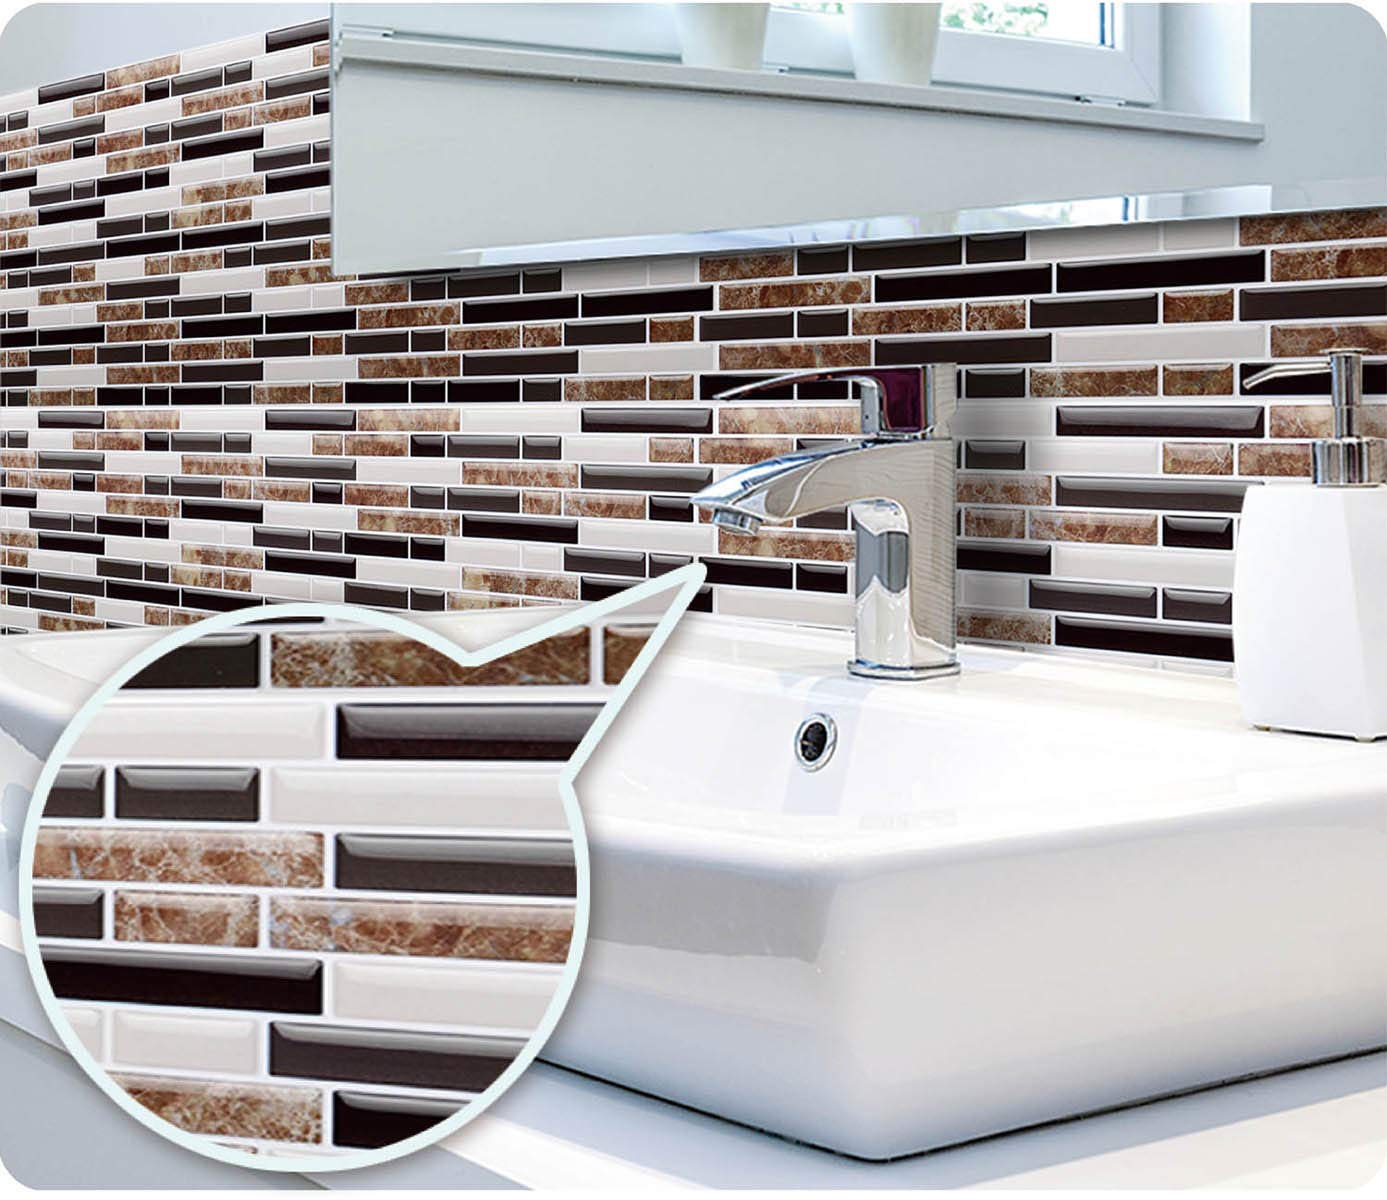 "Peel and Stick Backsplash,HONJAN Renters Groutless Removable Adhesive Vinyl Muretto Brina Backsplash Tiles for Kitchen Bathroom 10""x10"" Pack of 13 (A) by HONJAN (Image #6)"